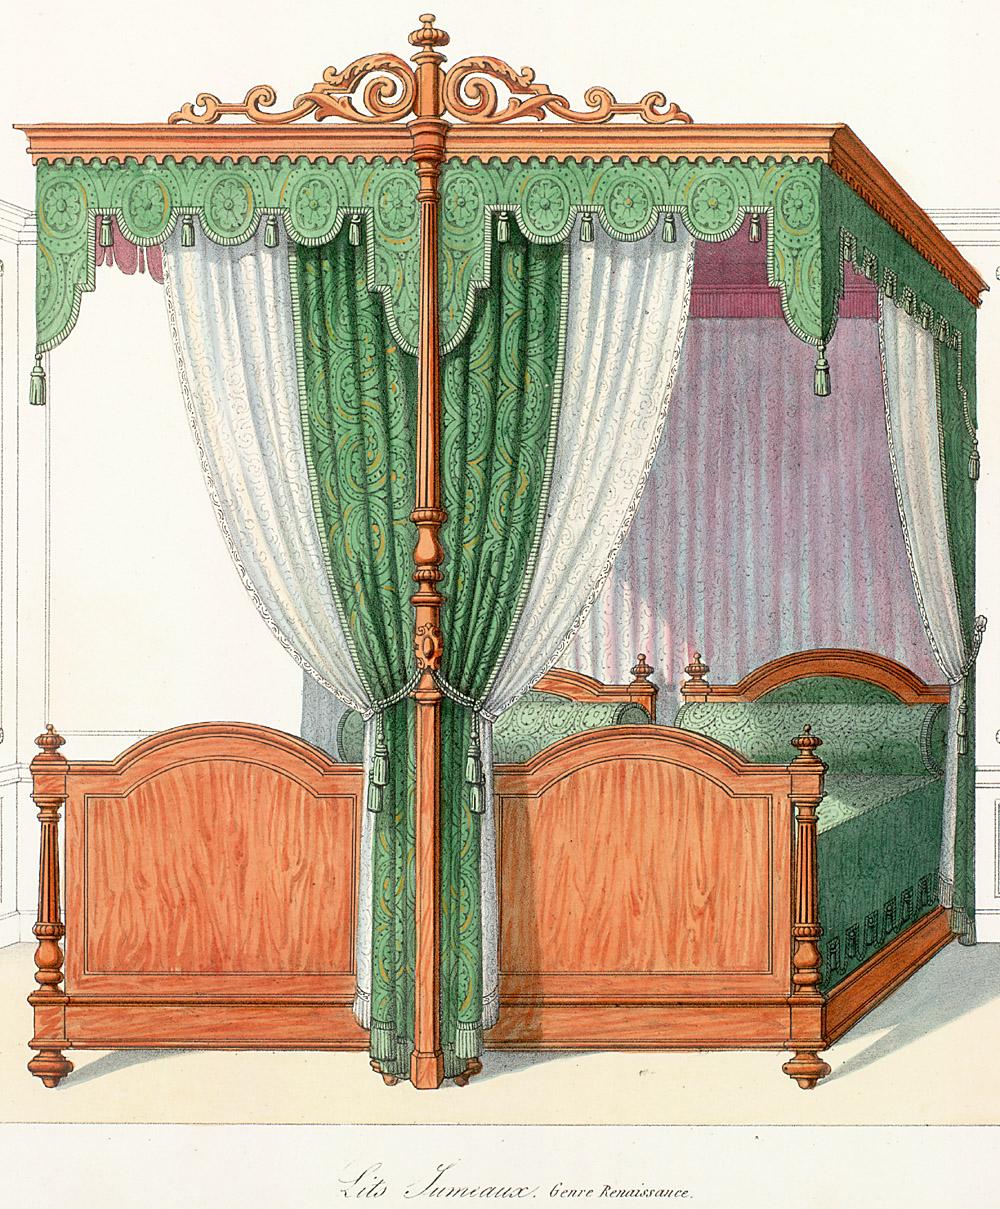 Beds (furniture),  Image number:SIL12-2-161b